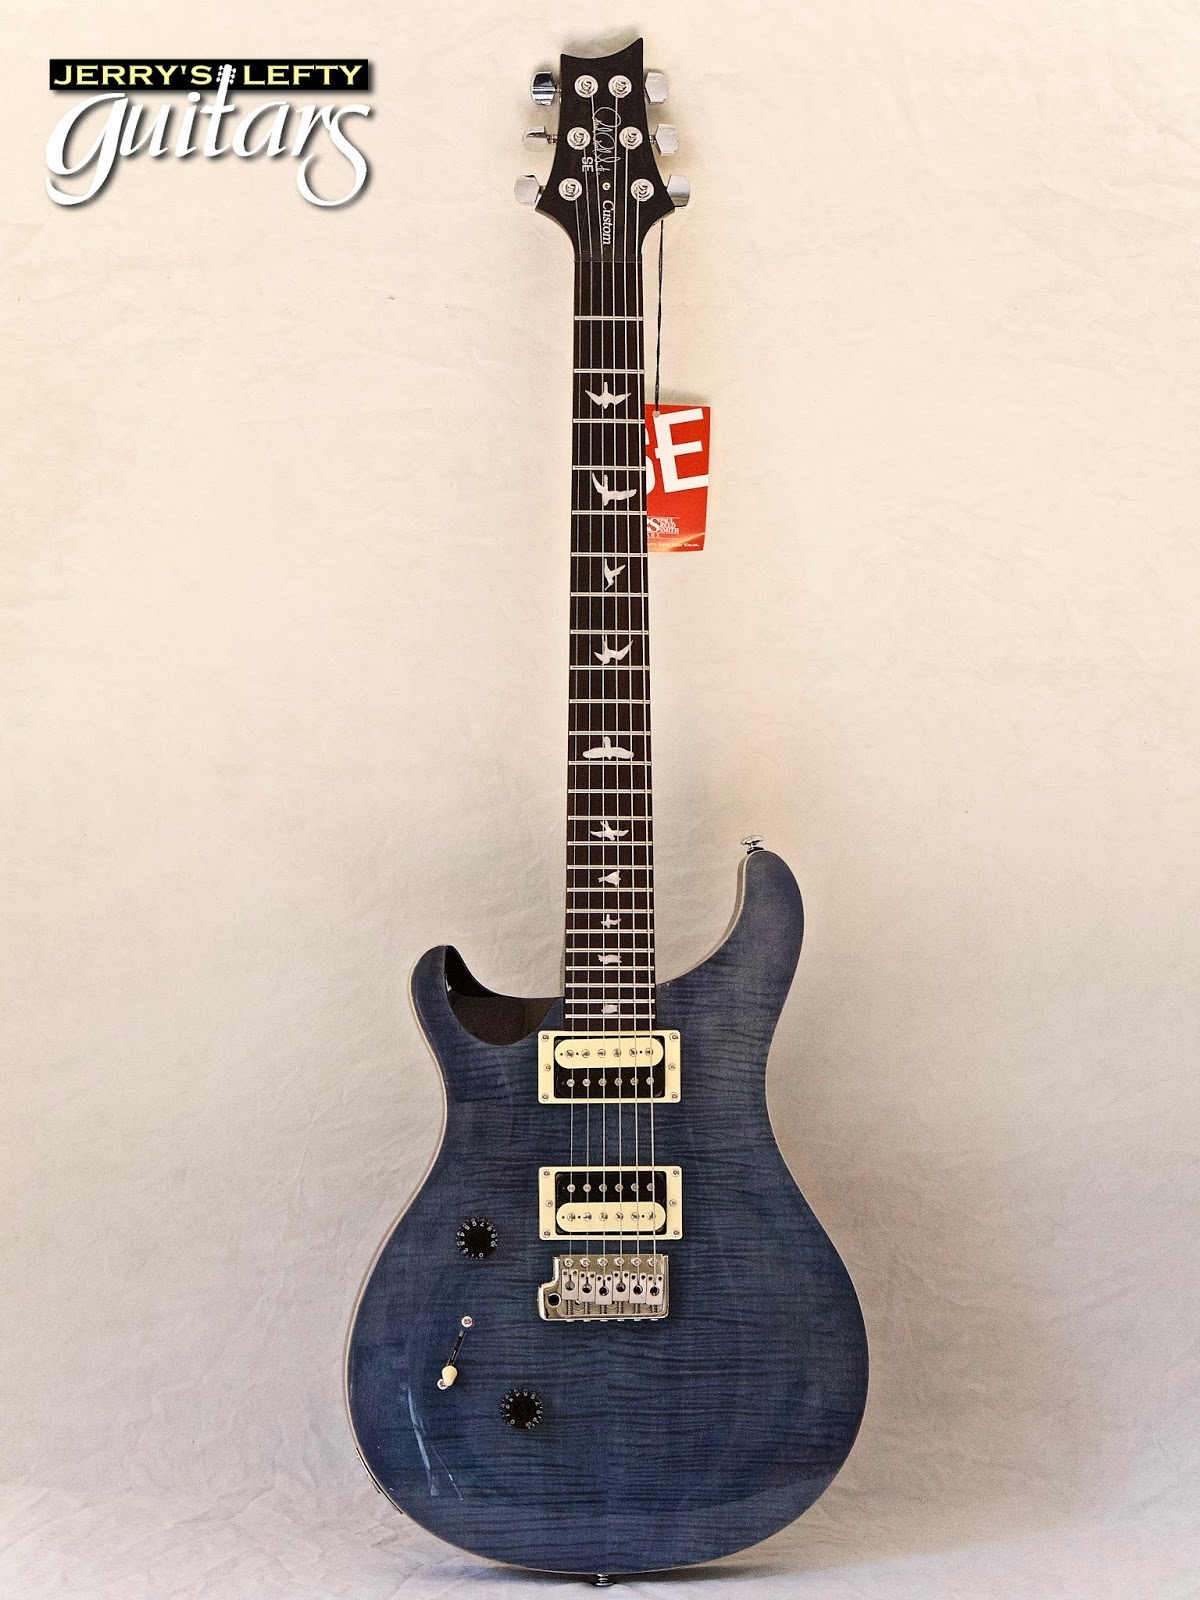 jerry 39 s lefty guitars newest guitar arrivals updated weekly prs se custom 24 whale blue 908. Black Bedroom Furniture Sets. Home Design Ideas